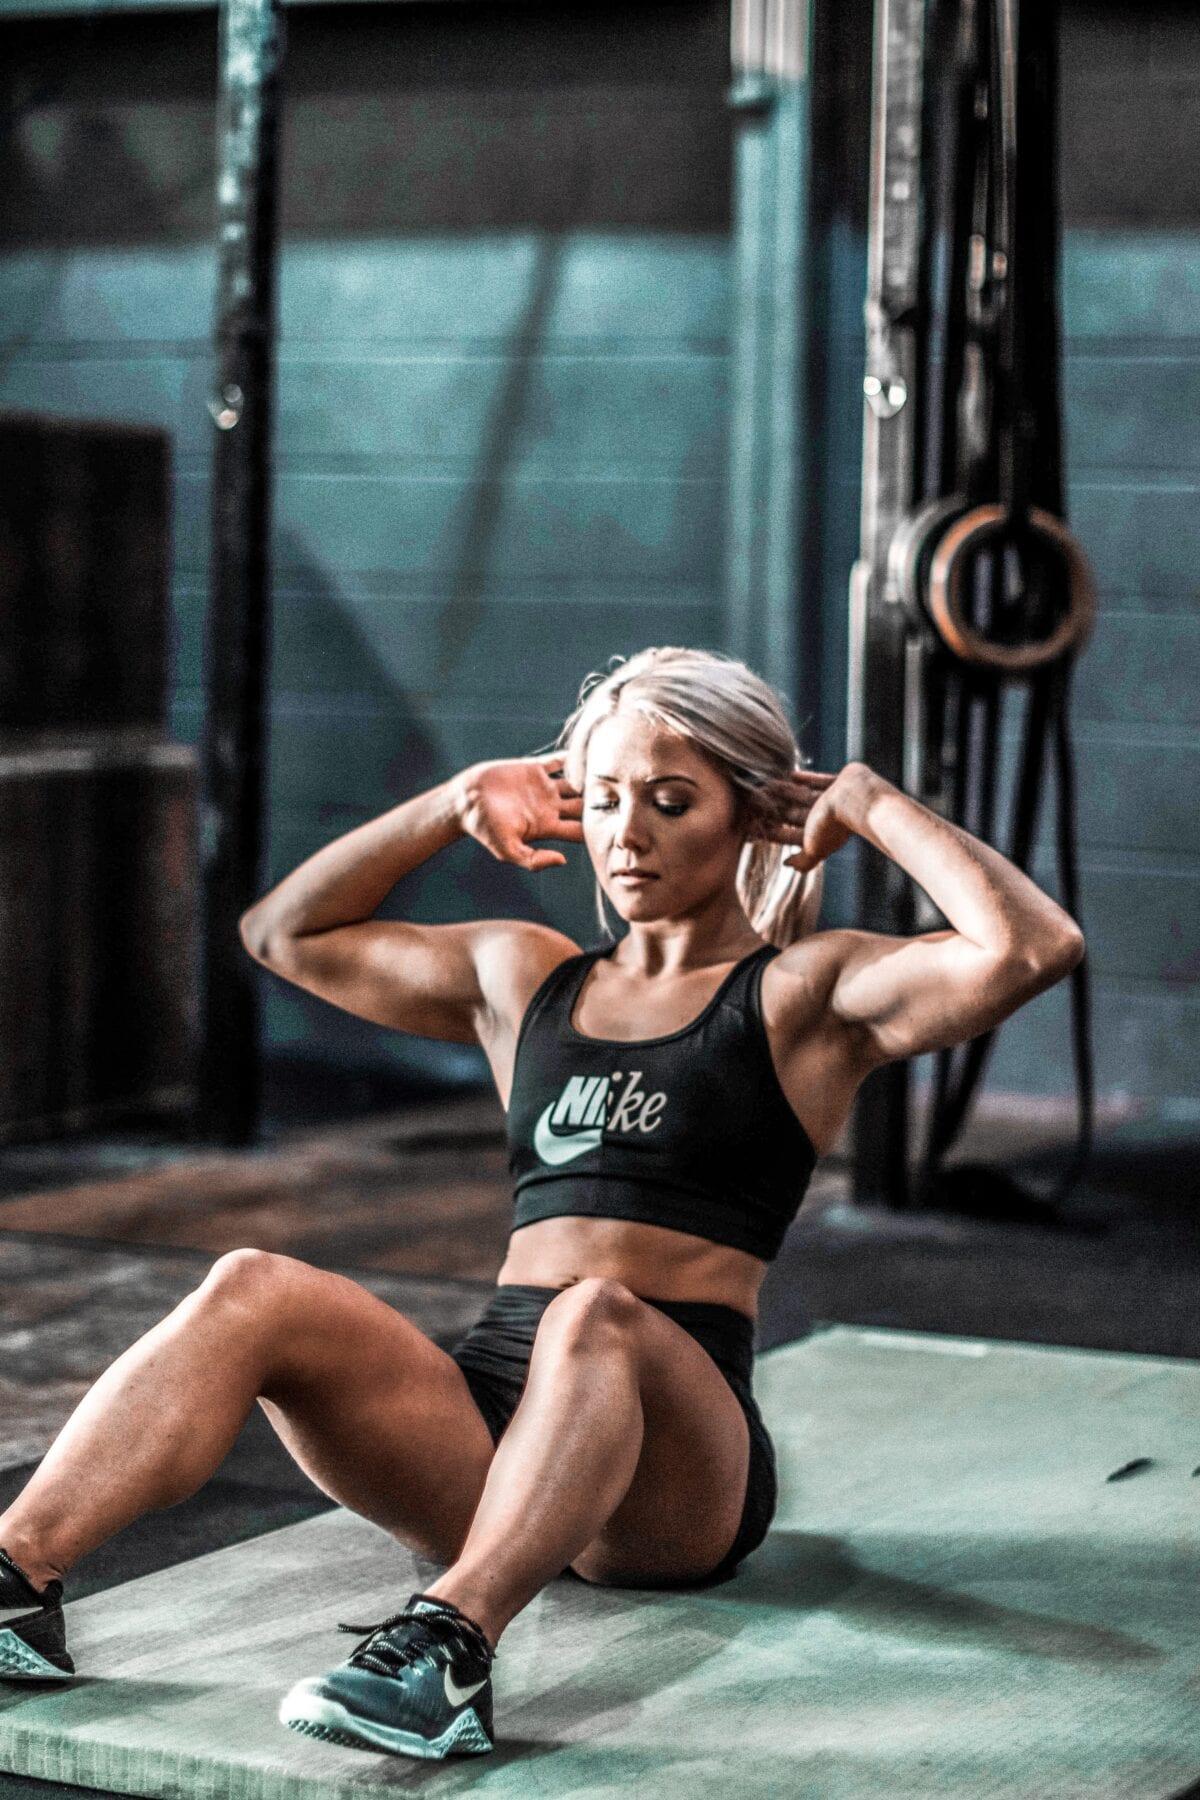 HIIT training sit up